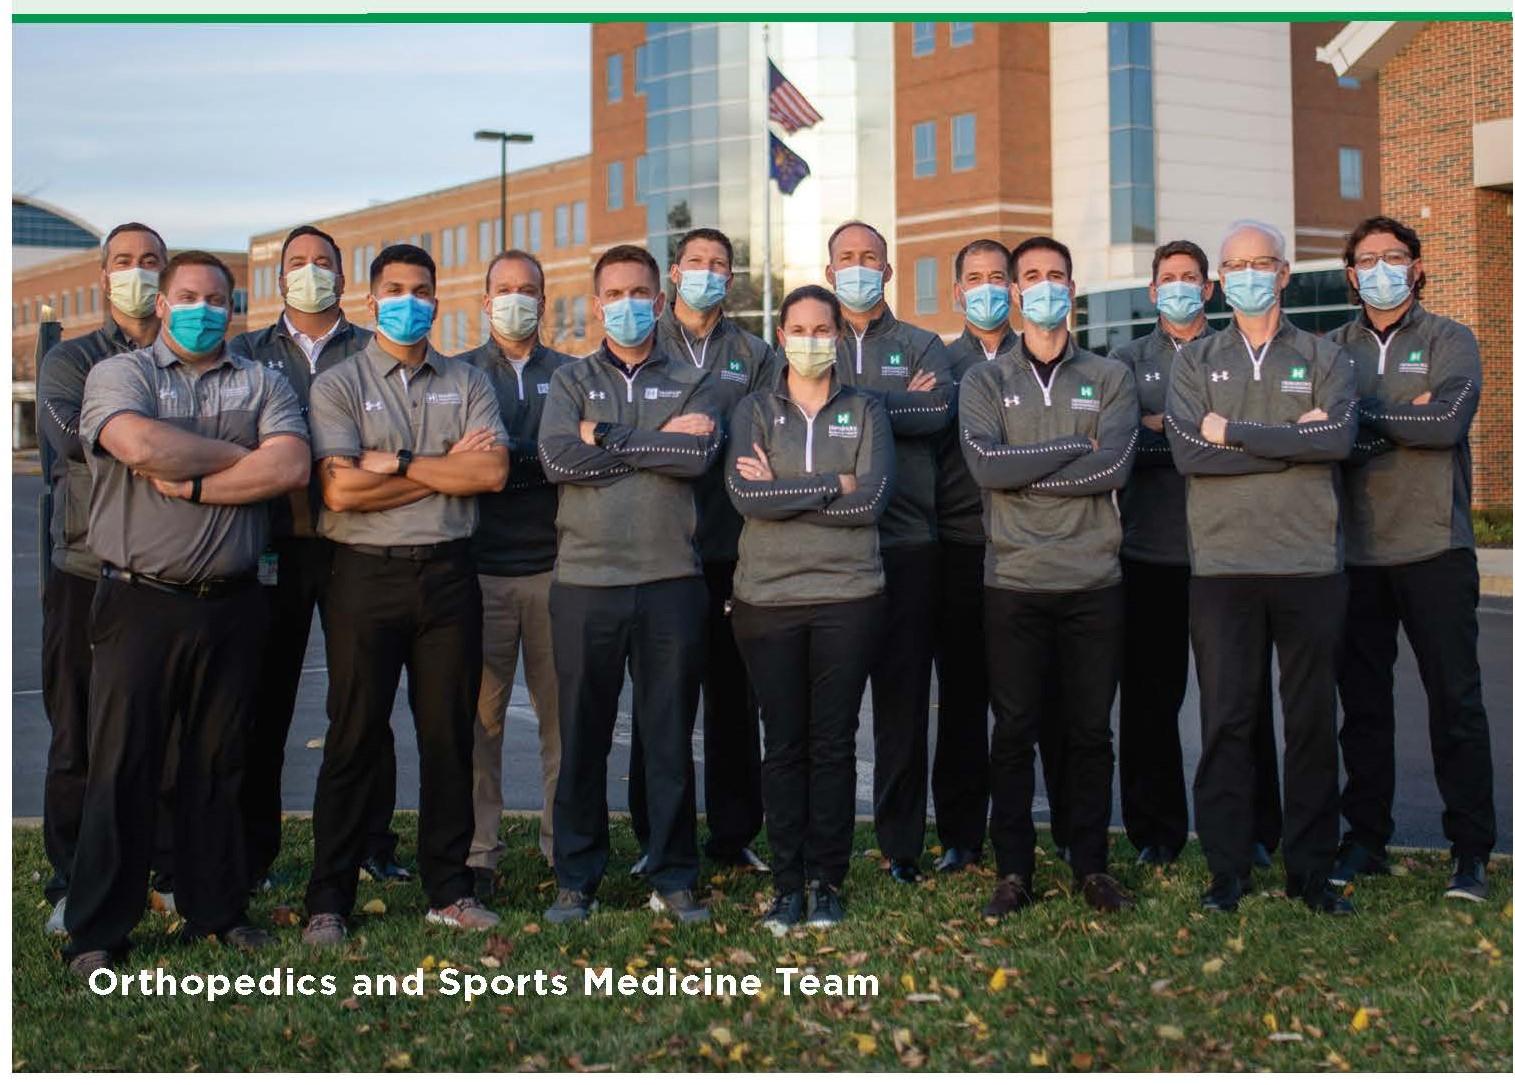 Orthopedics and Sports Medicine Team